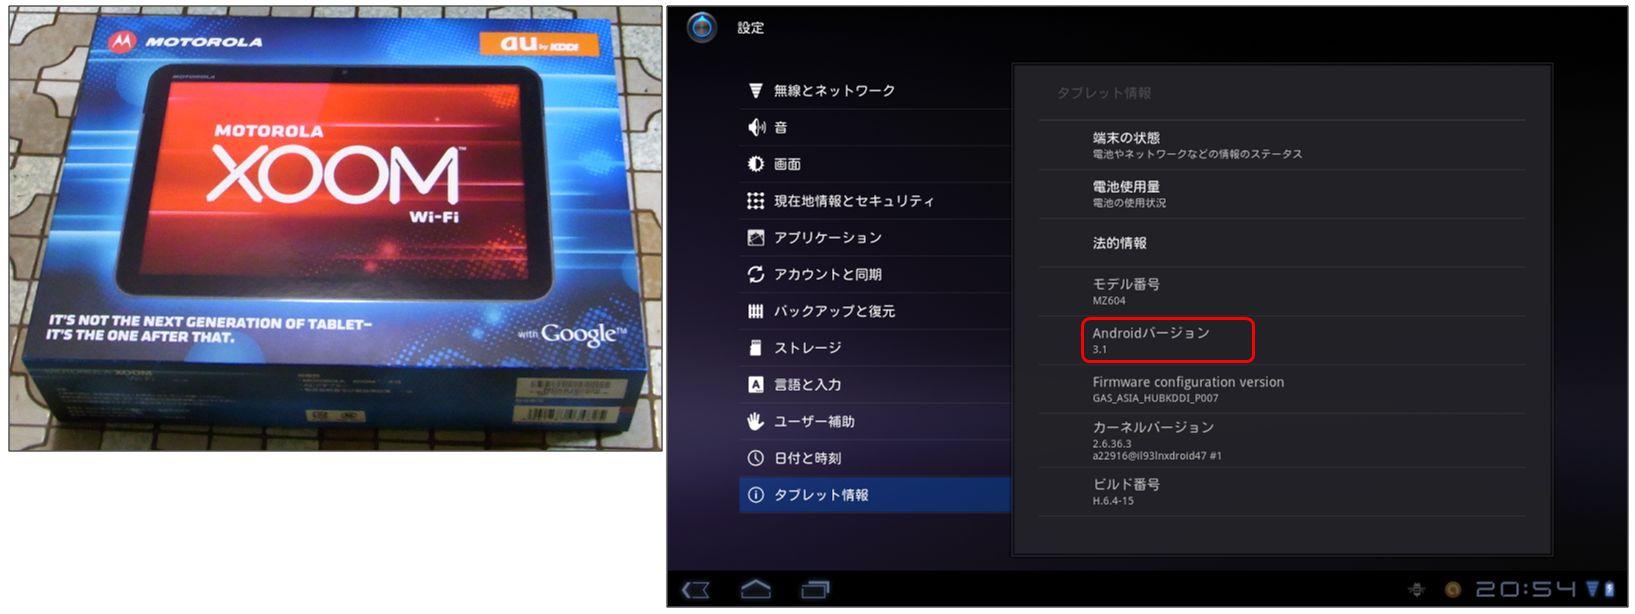 XooM version 3.1